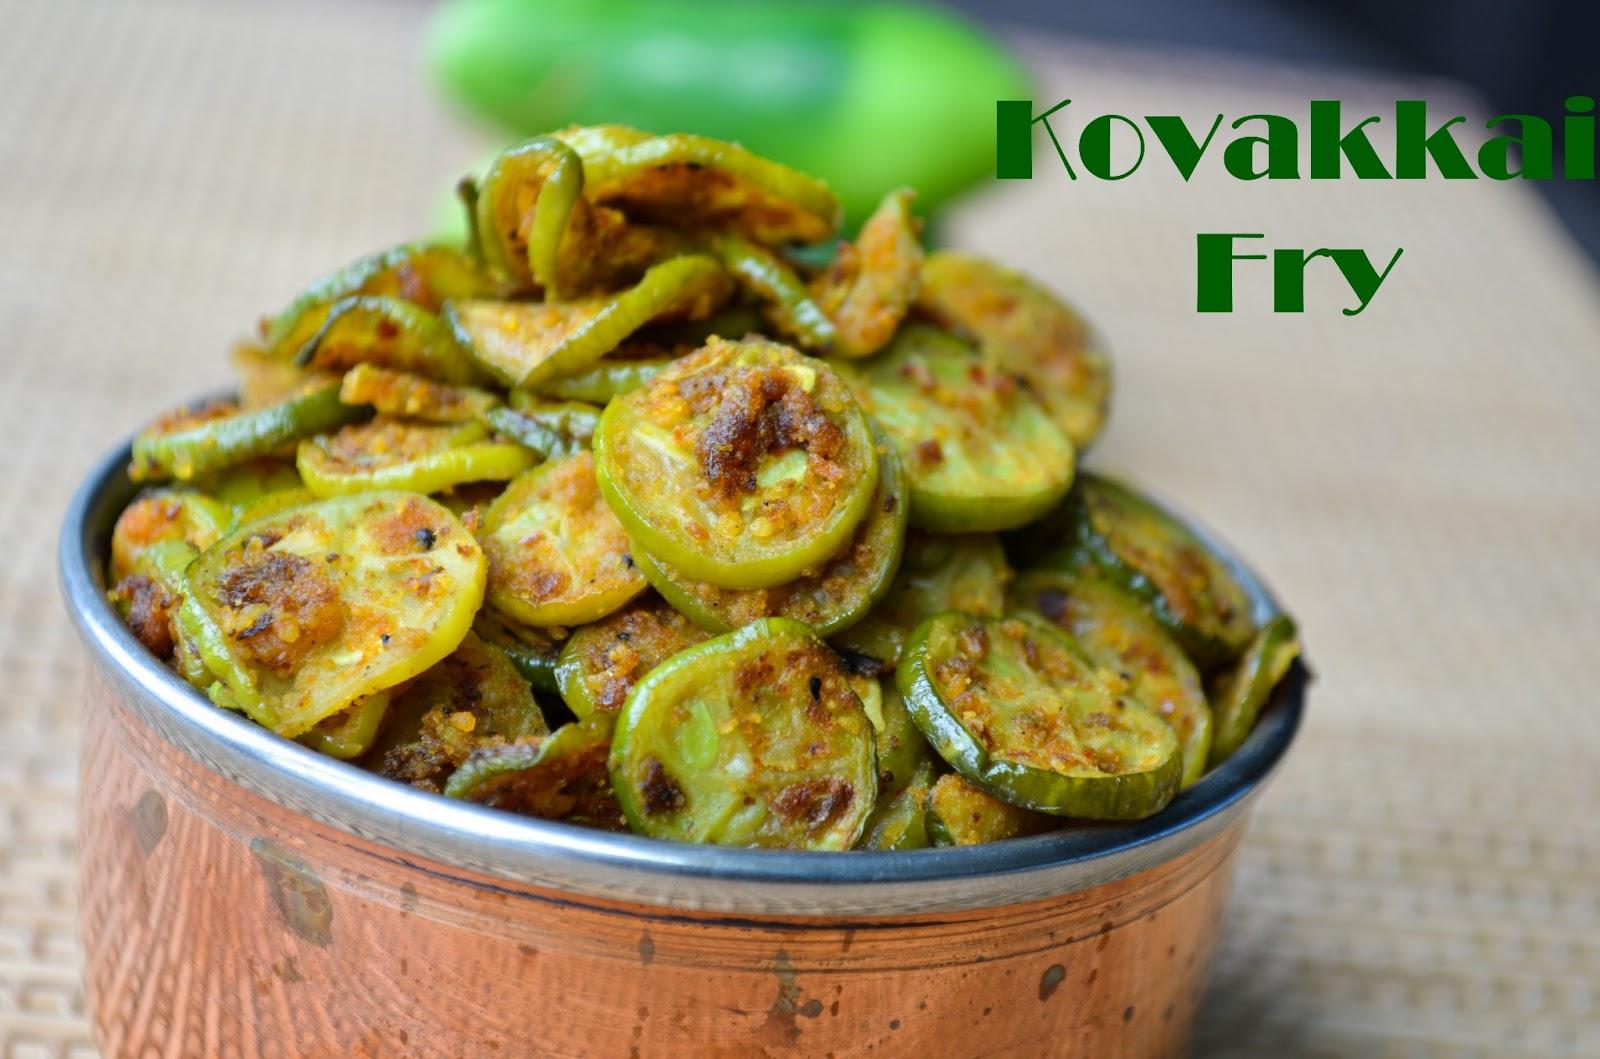 Samayal2impress kovakkai stir fry kovakkai is used traditionally to control fever asthma bronchitis and jaundice it also helps to regulate the blood sugar levels forumfinder Choice Image